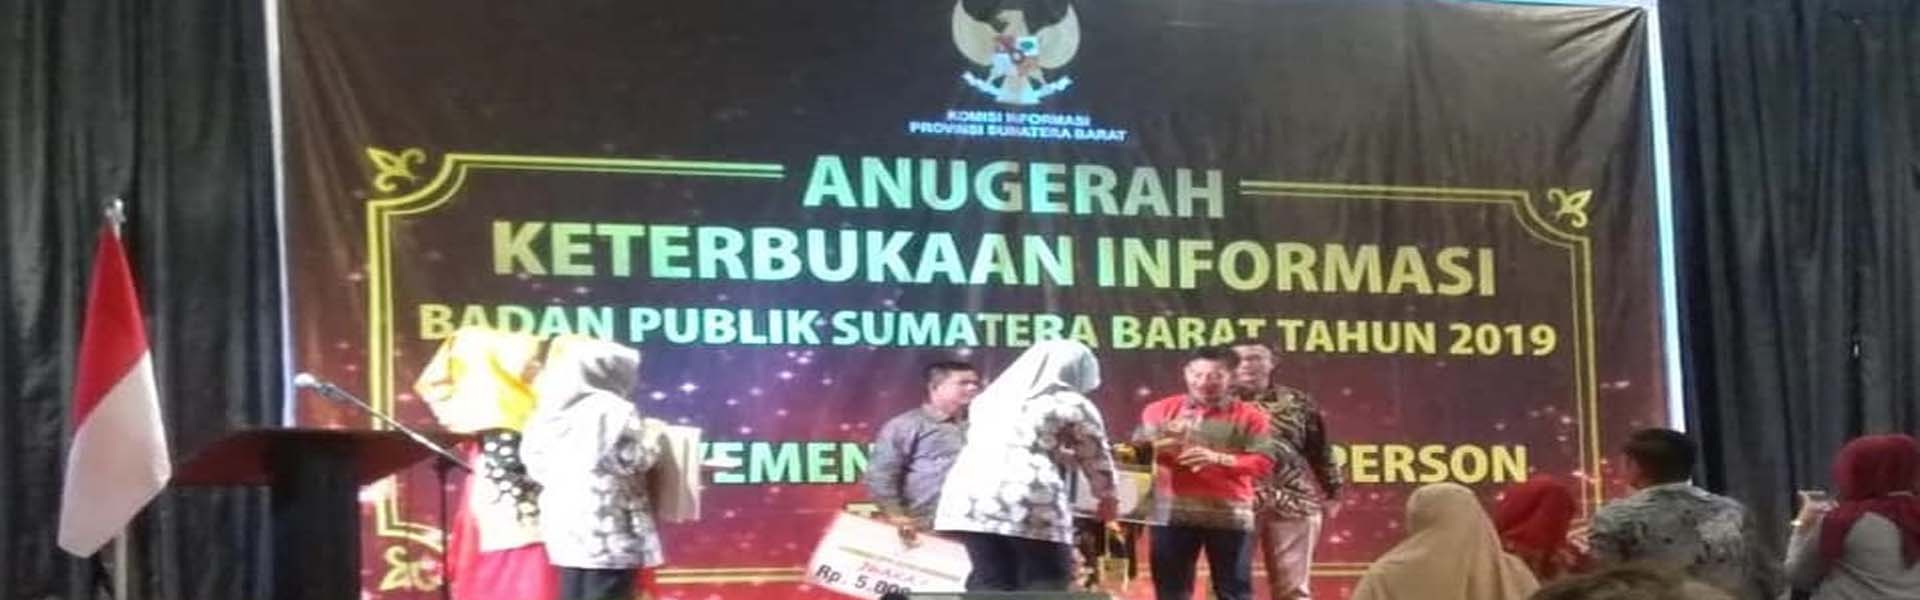 Anugerah Keterbukaan Informasi Publik se - Sumatera Barat 2019 Tingkat KPU Kab/Kota